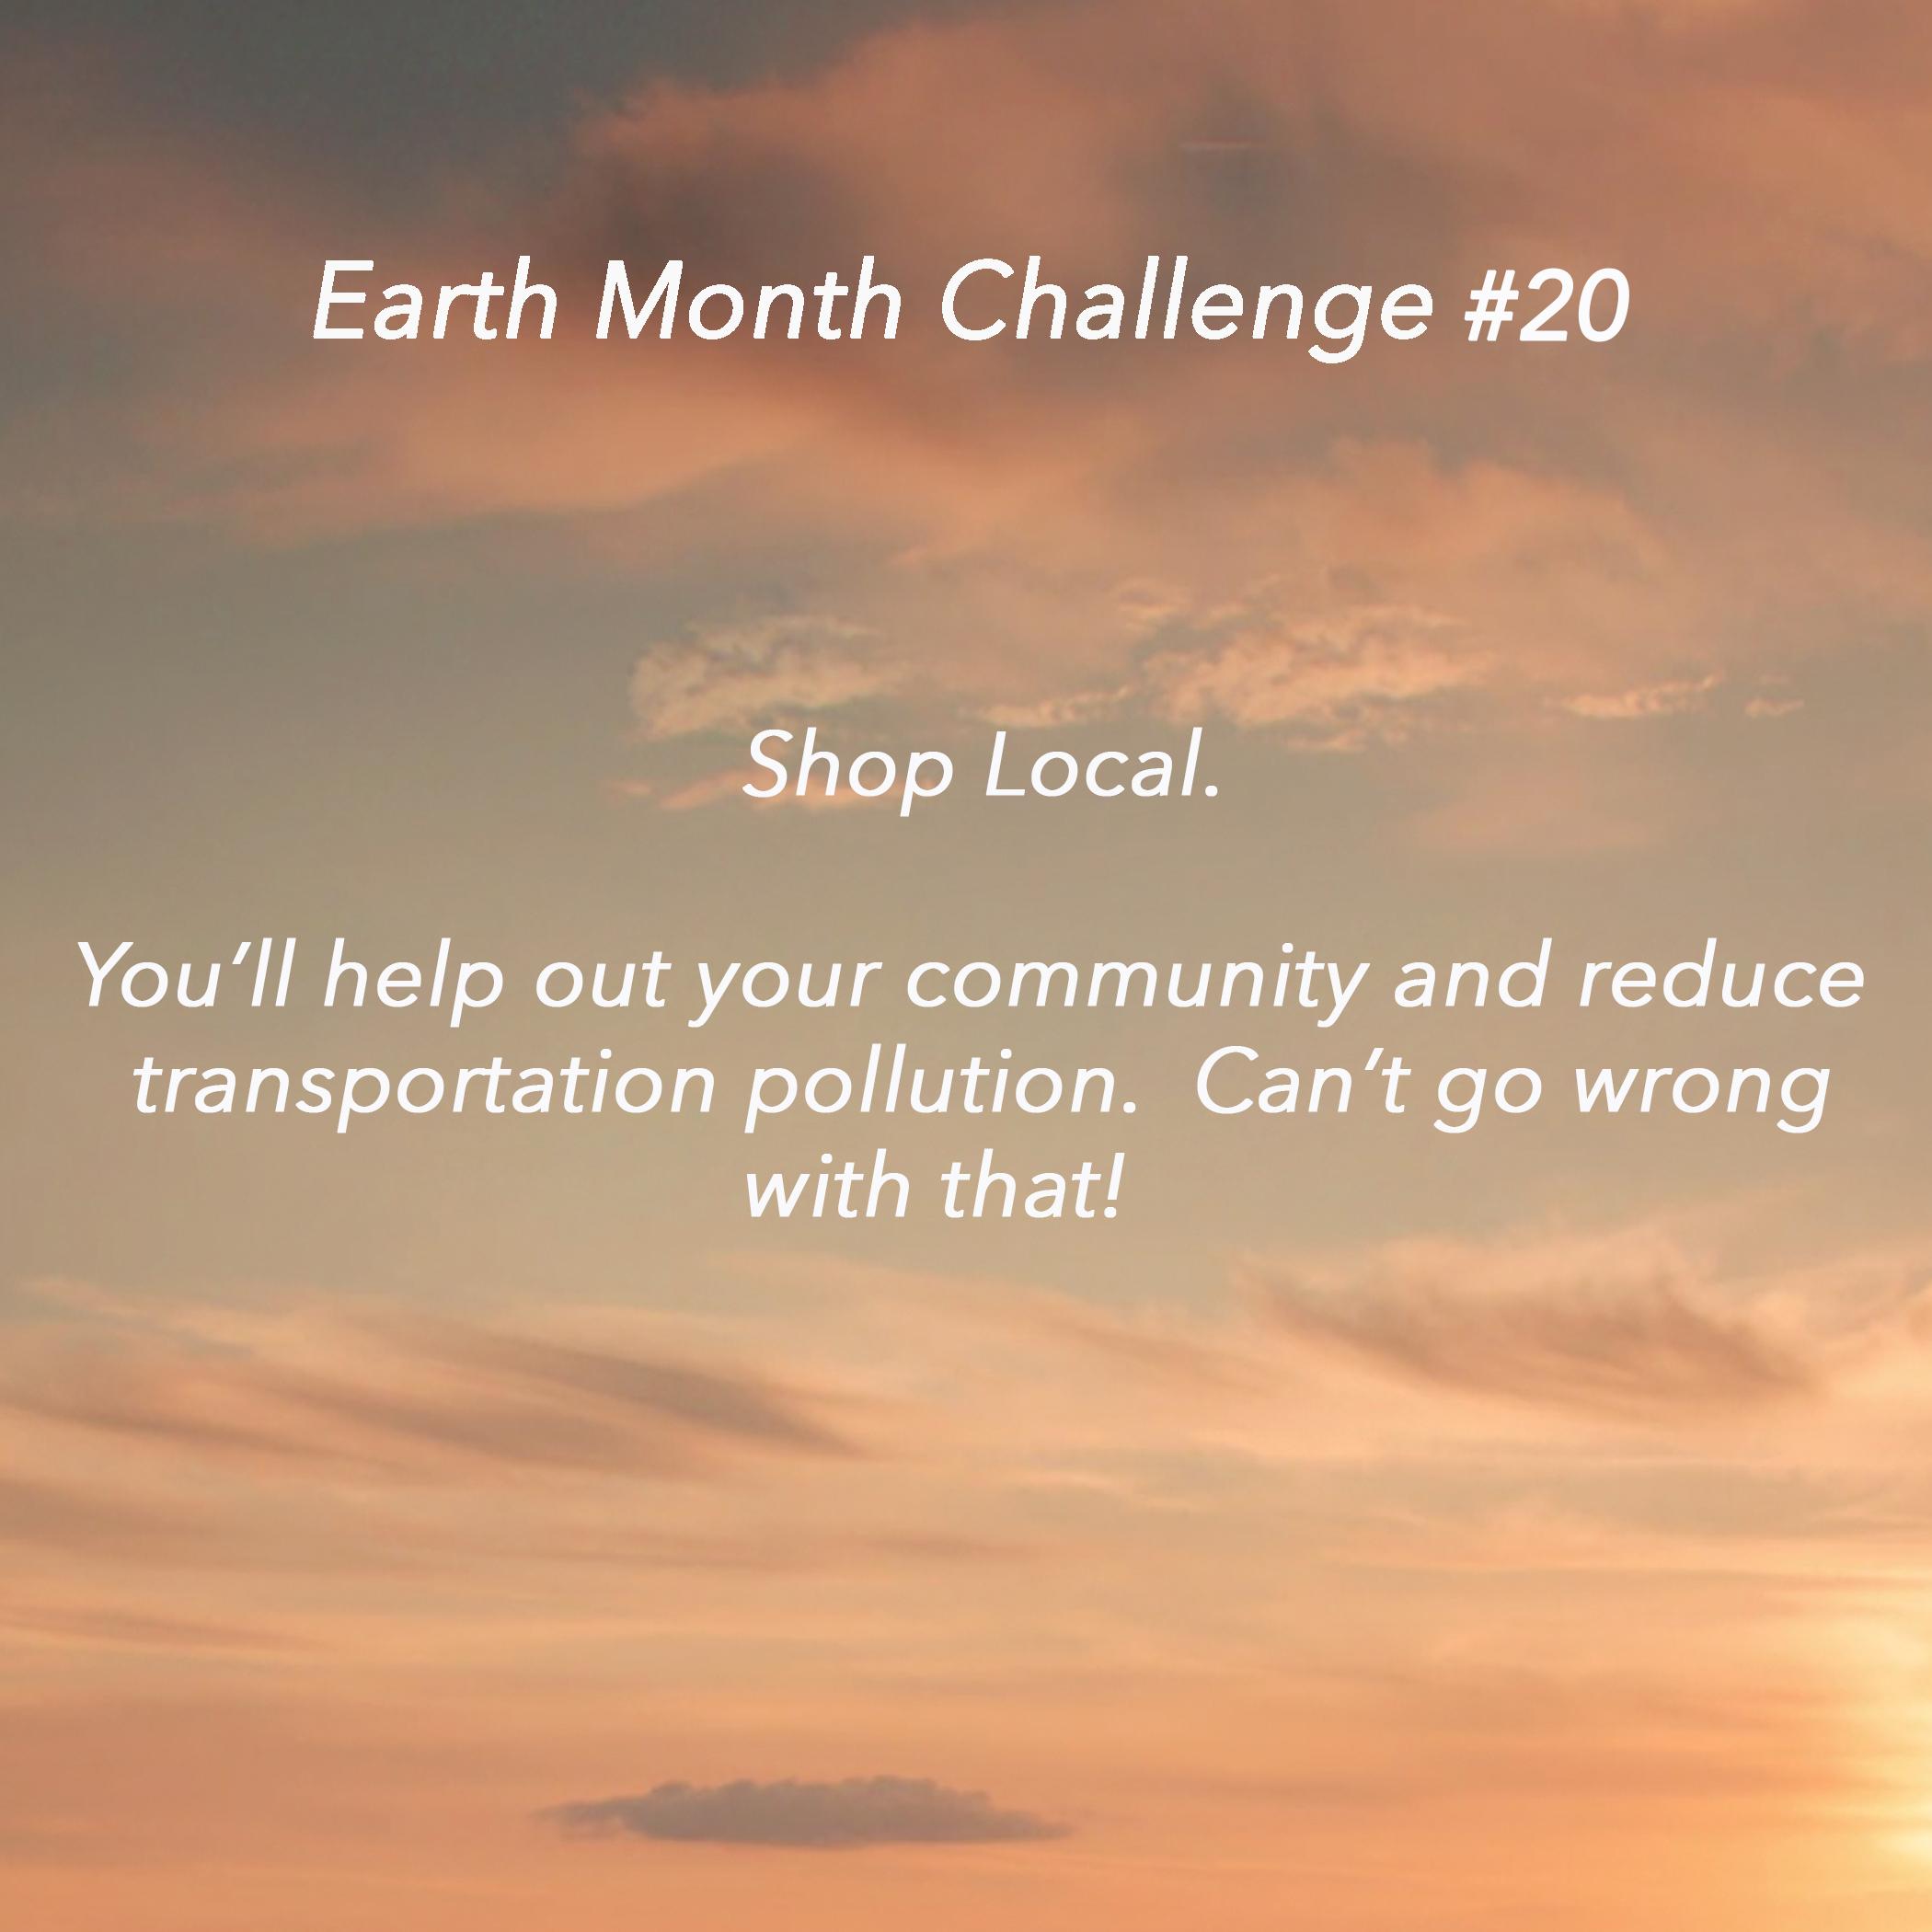 challenge_20.jpg